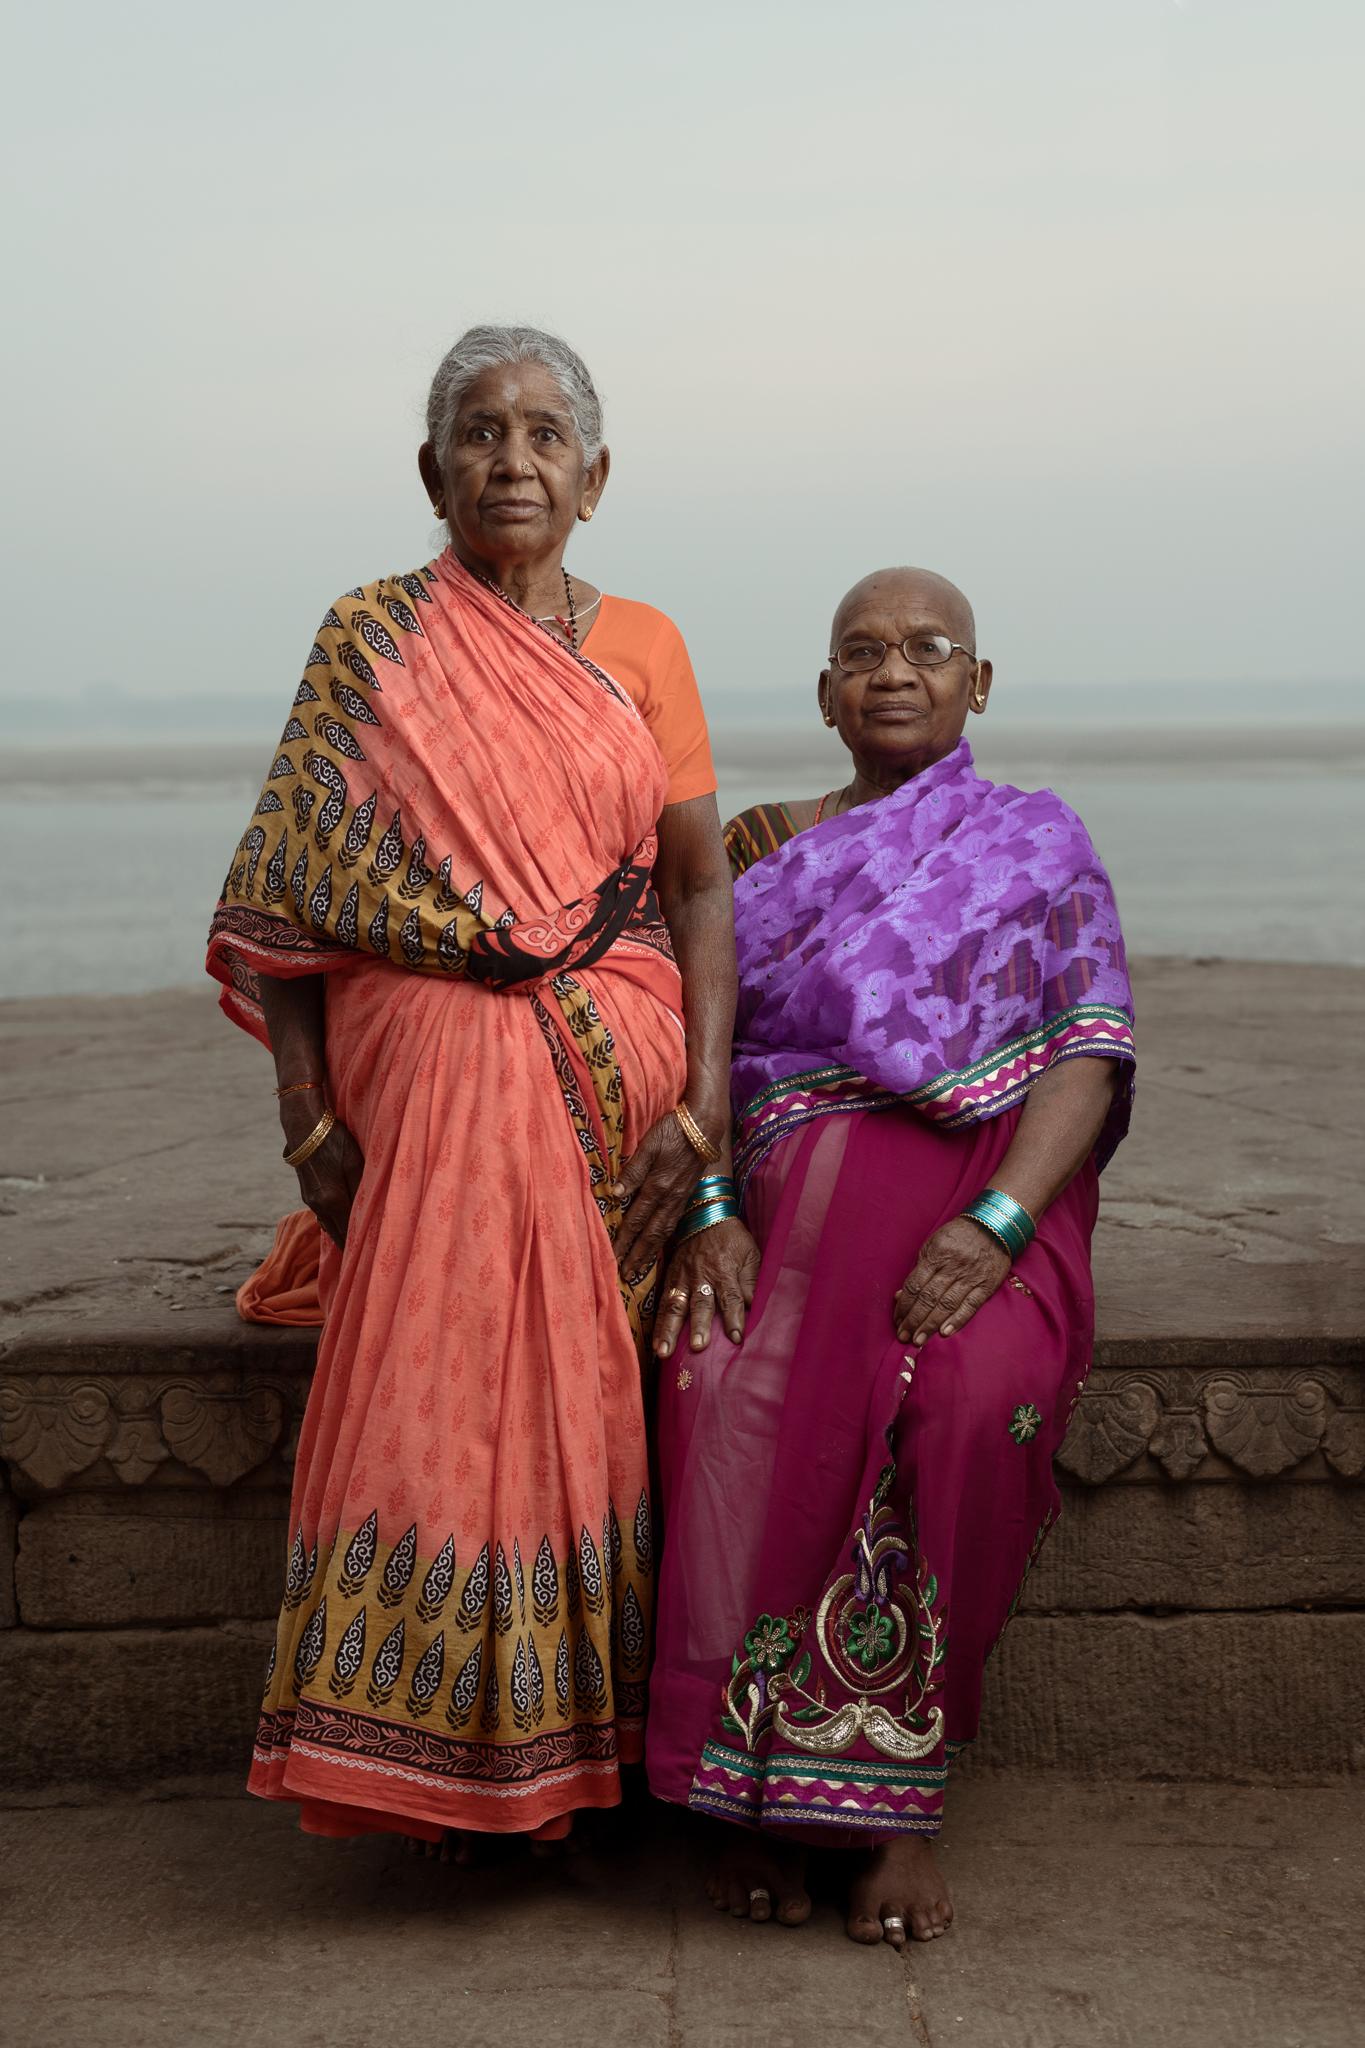 Varanasi_portrait_travel_photography_Manchester_Adventure_Photographer_Jan_Bella12.jpg